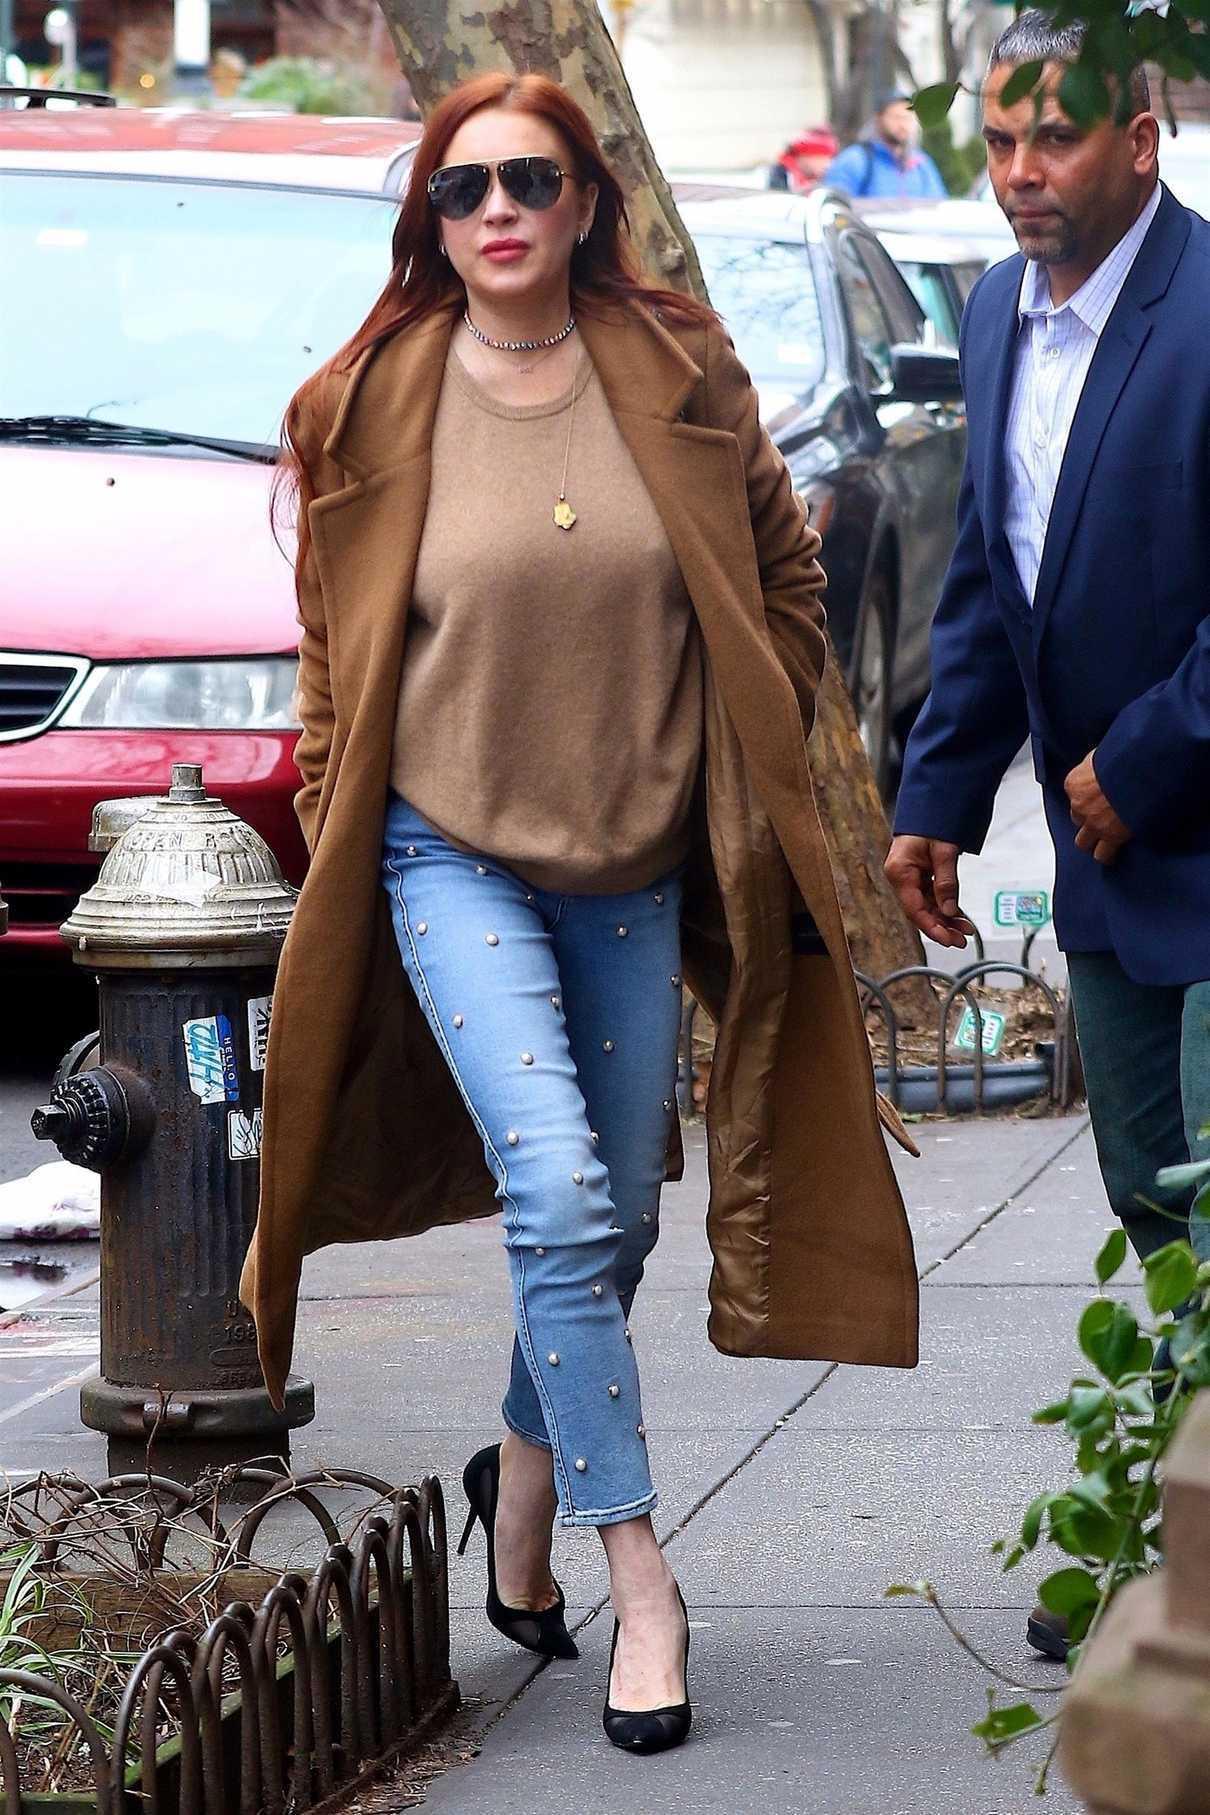 Lindsay Lohan in a Beige Coat